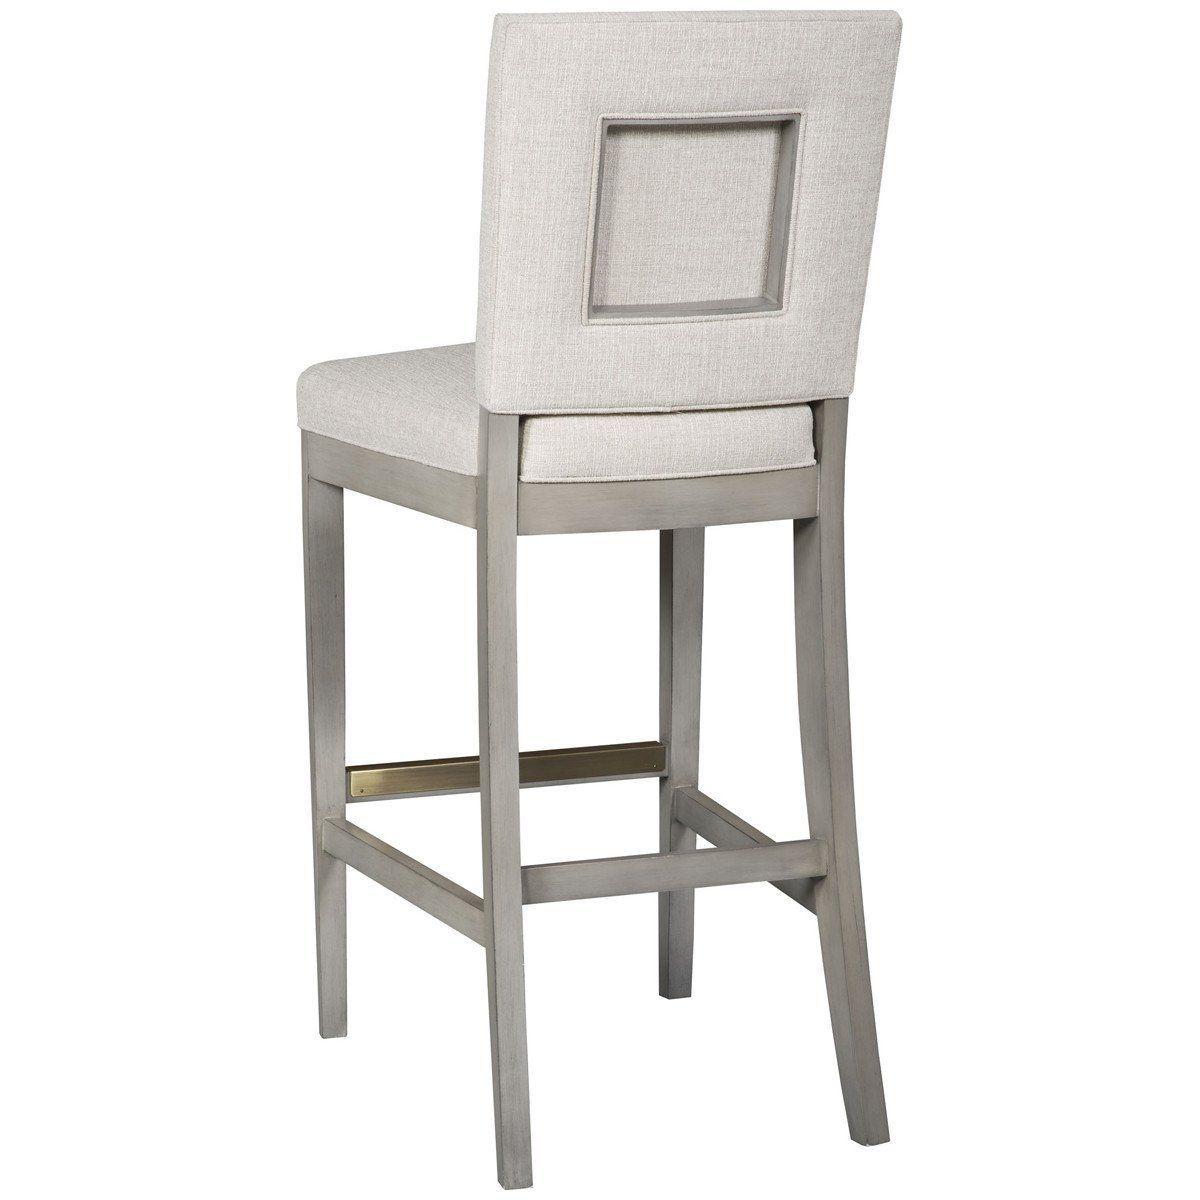 Brilliant Vanguard Furniture Juliet Stocked Performance Bar Stool Alphanode Cool Chair Designs And Ideas Alphanodeonline